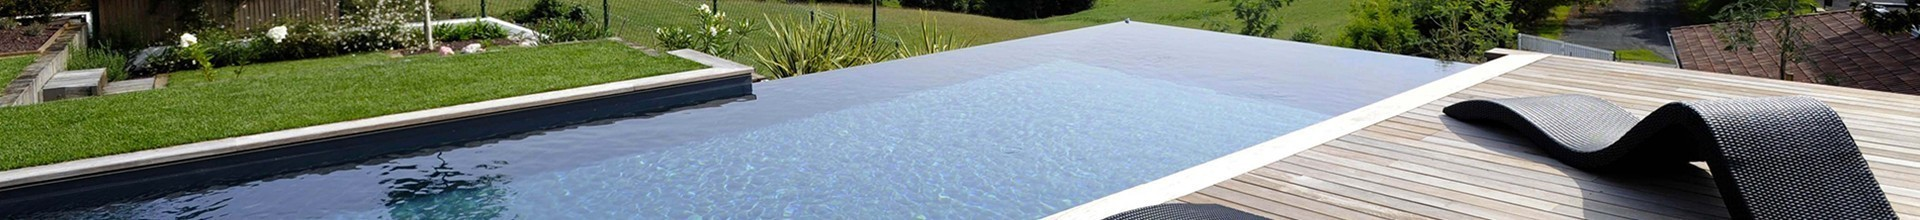 Constructeur piscine discount Hauts de France